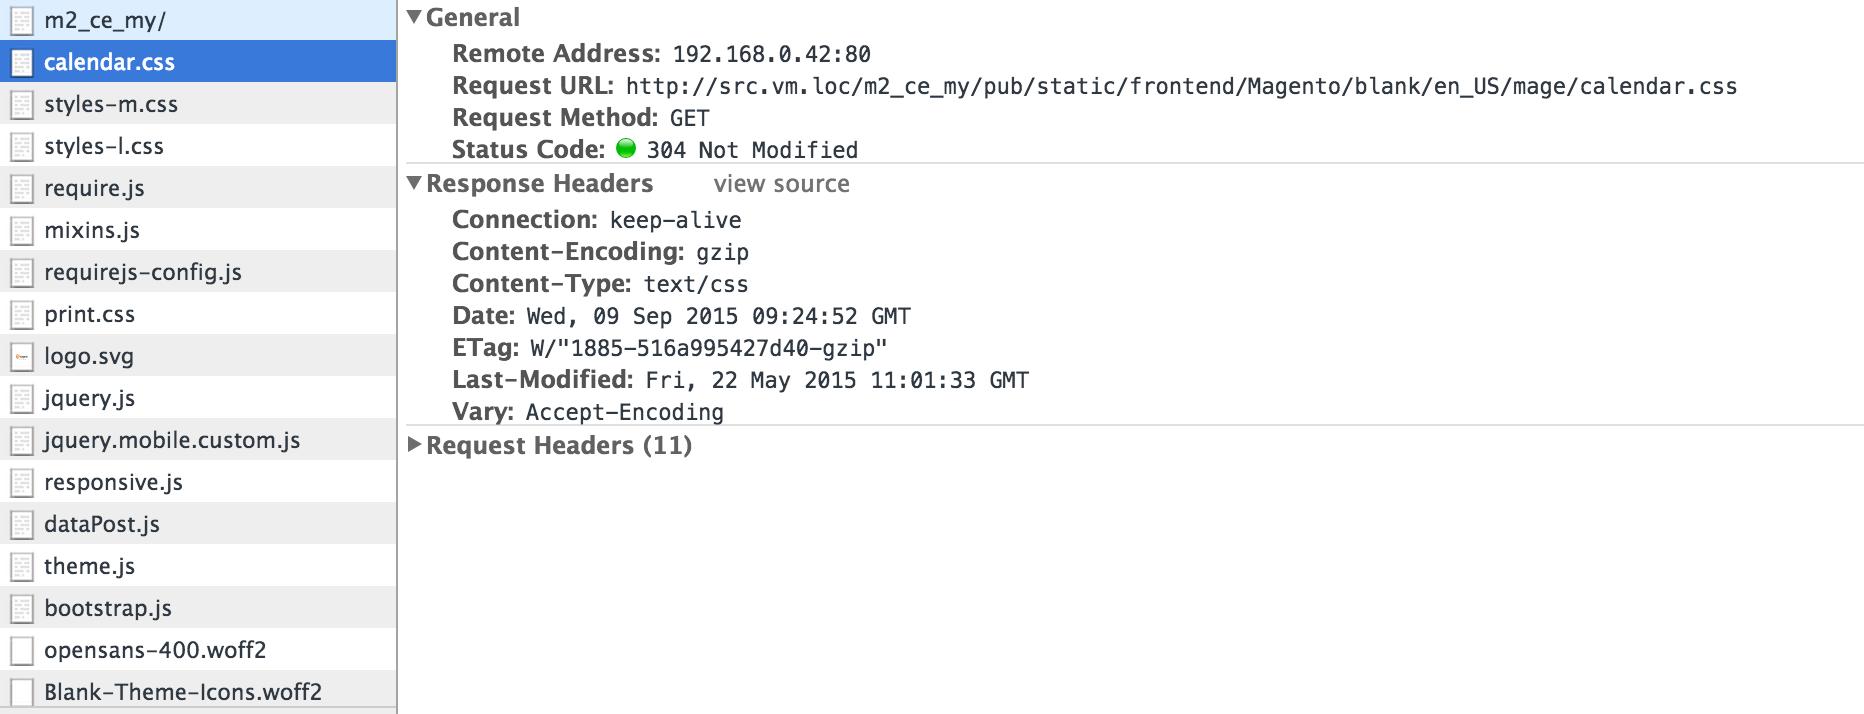 F5 Export Configuration Files